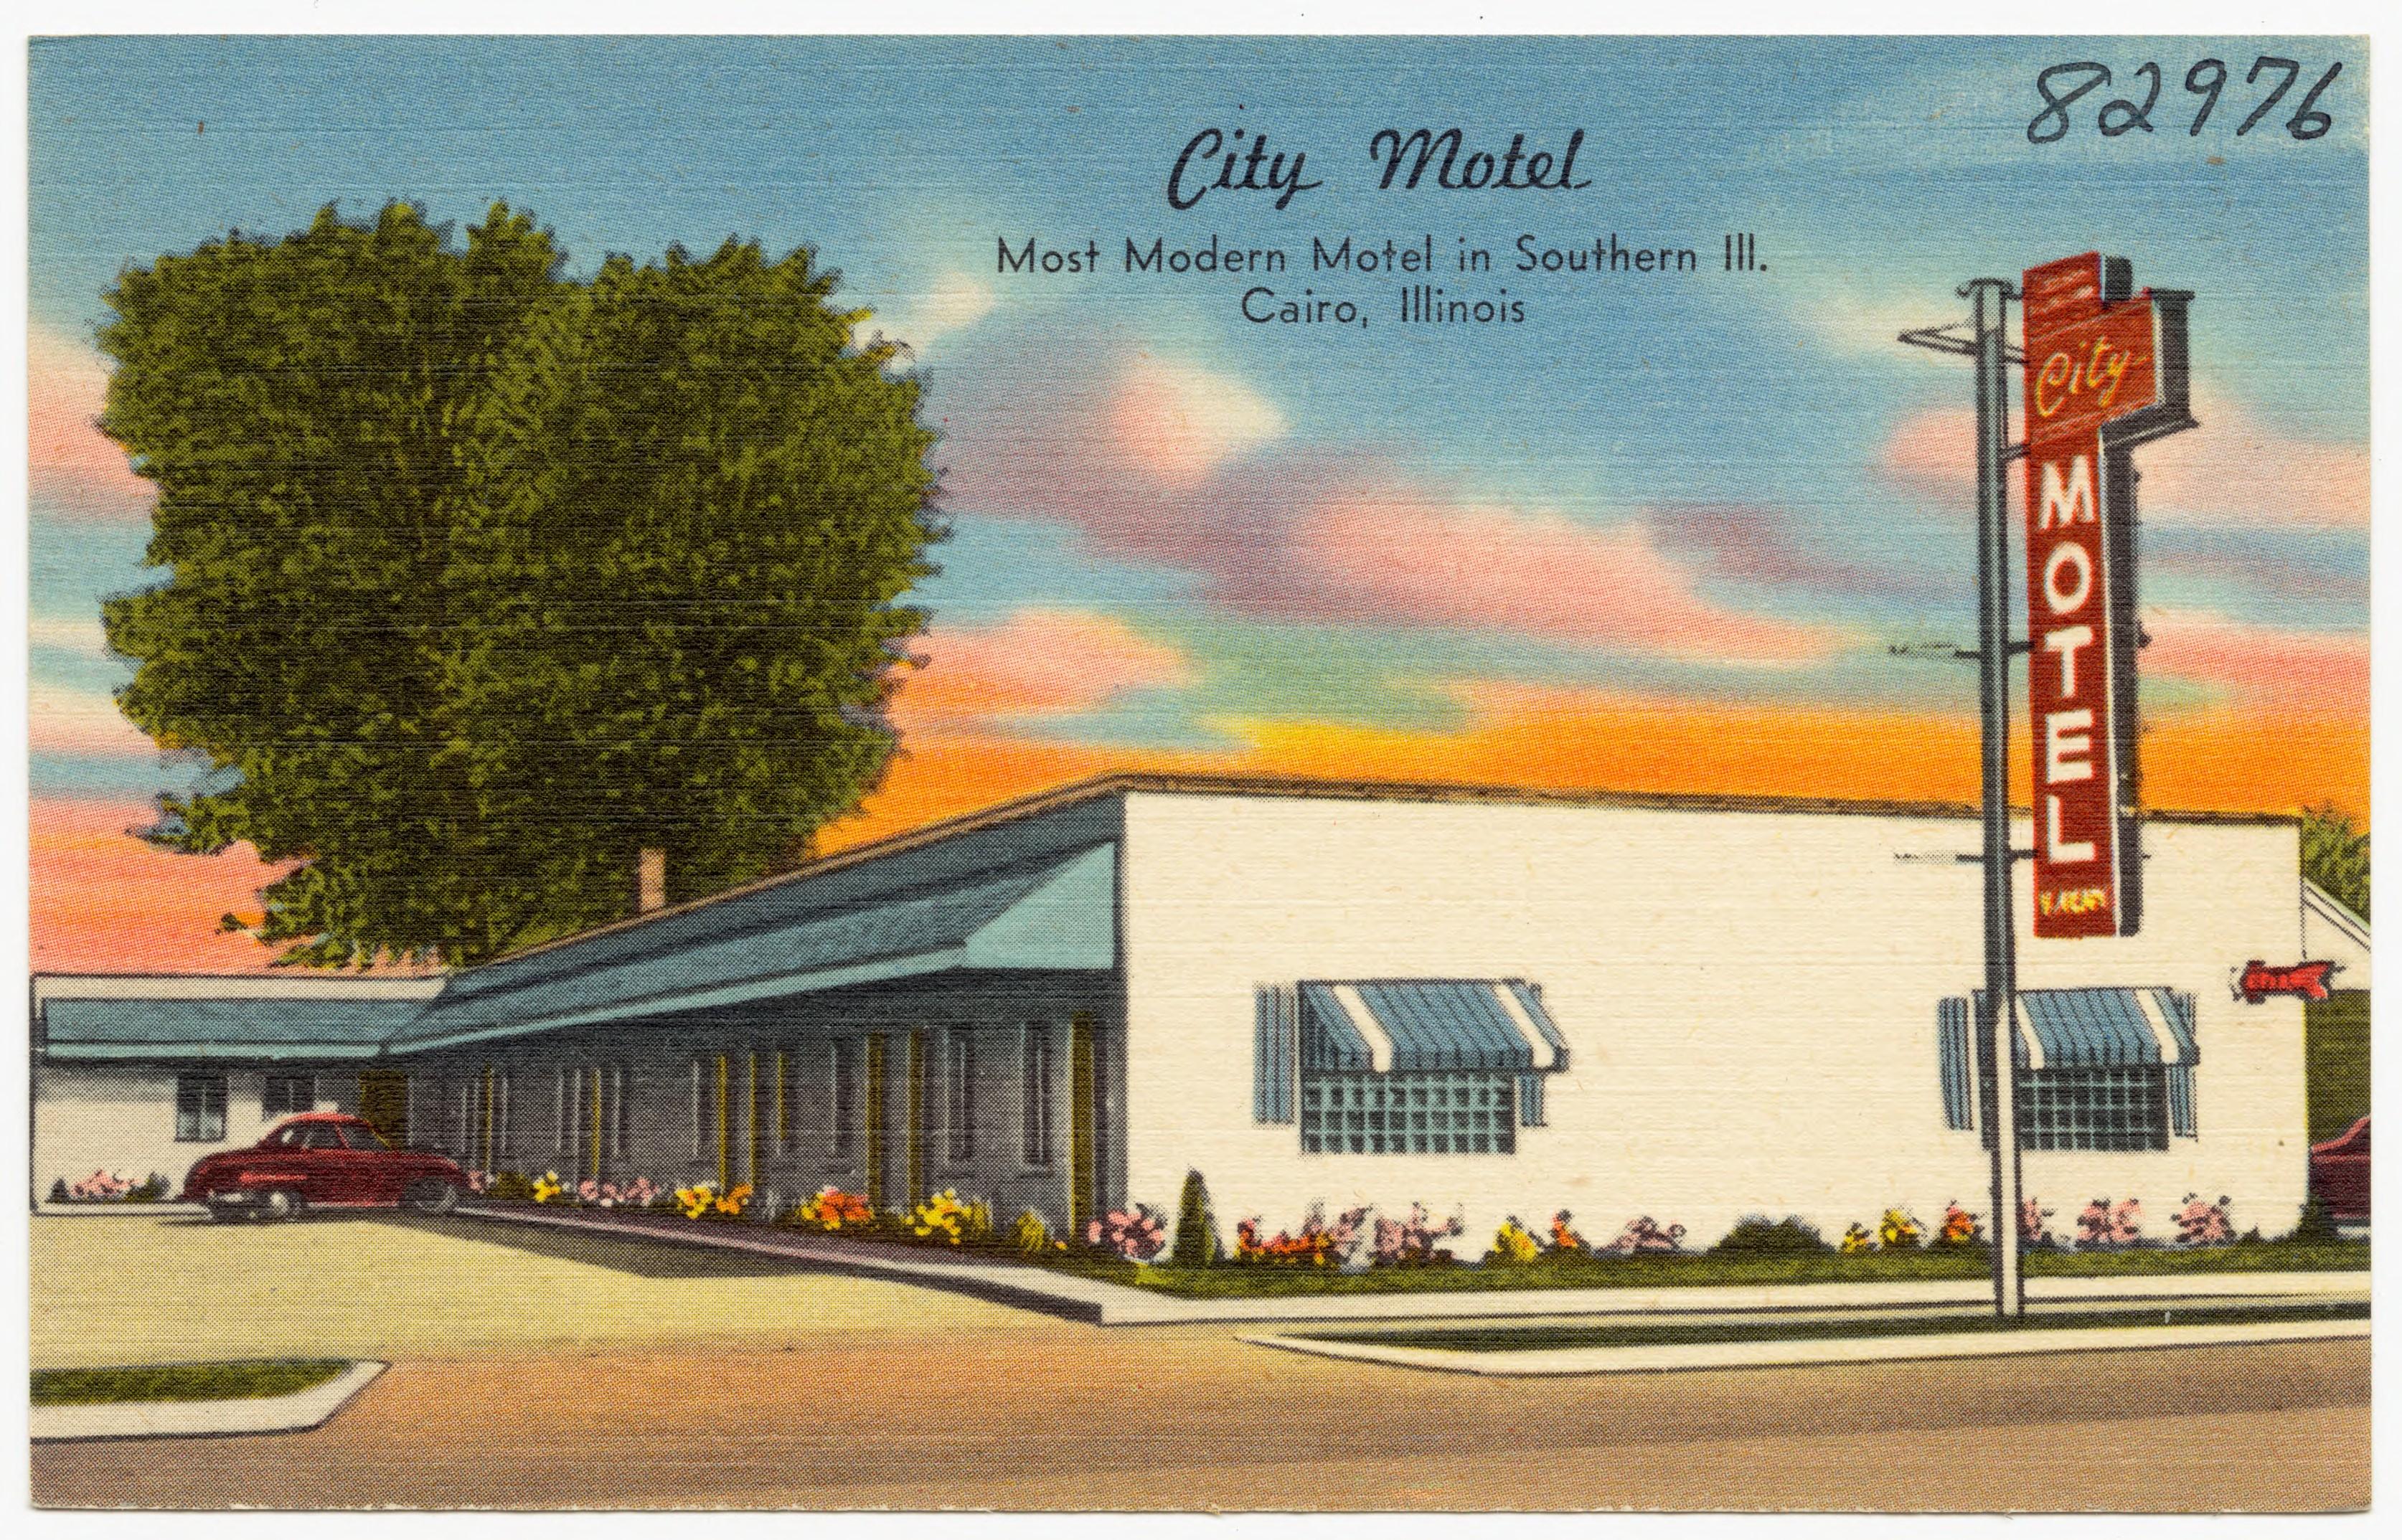 Junction City Motels